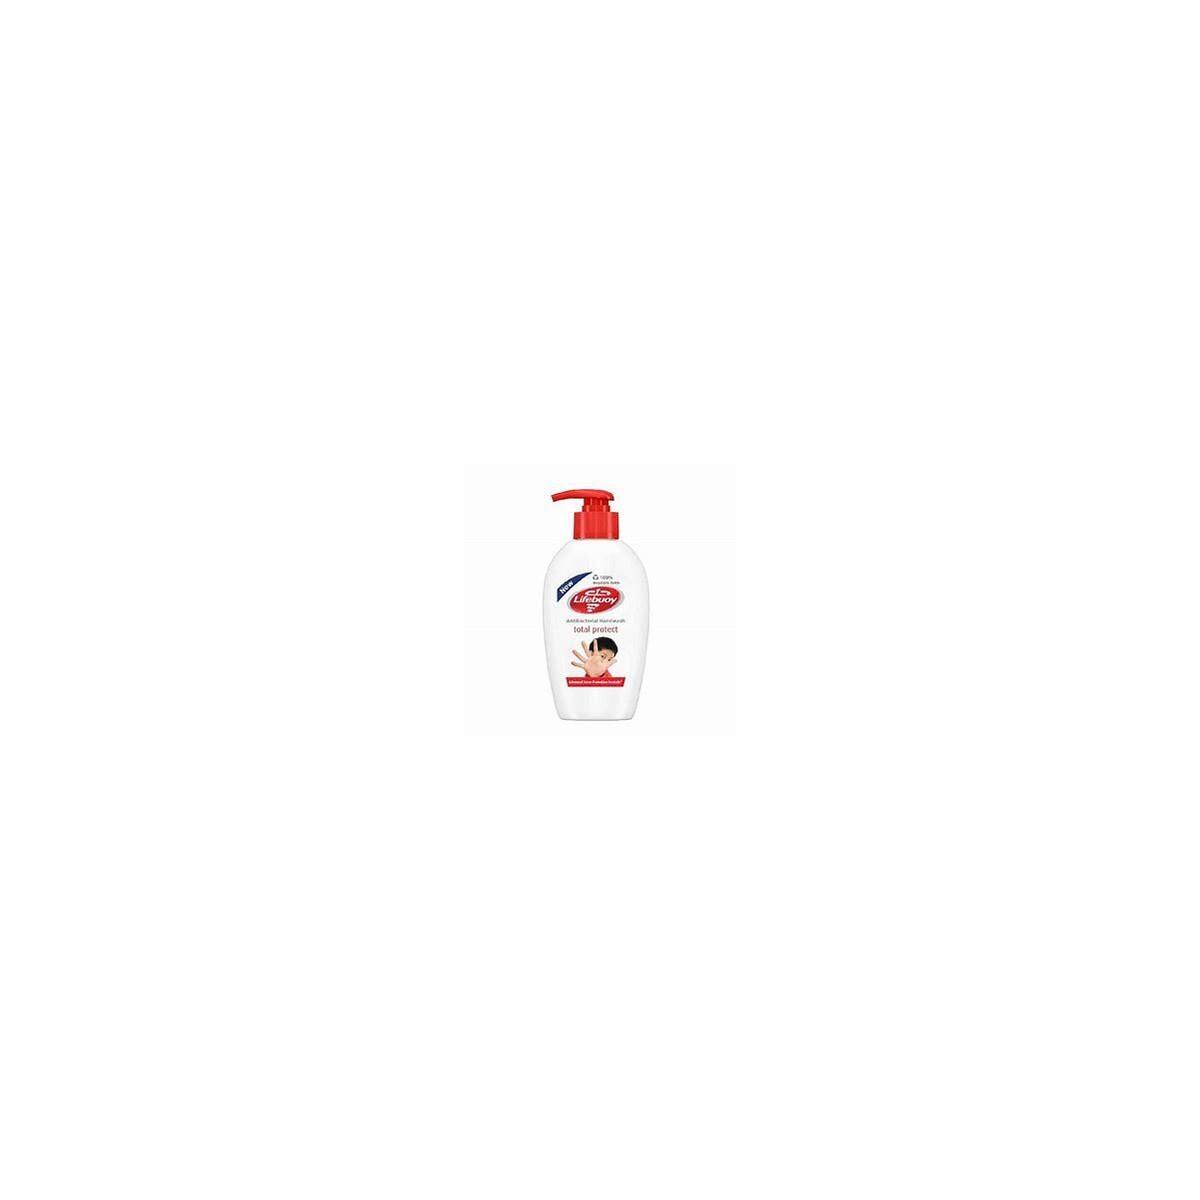 LIFEBUOY ANTIBACTERIAL HAND WASH TOTAL PROTECT 12/200ML